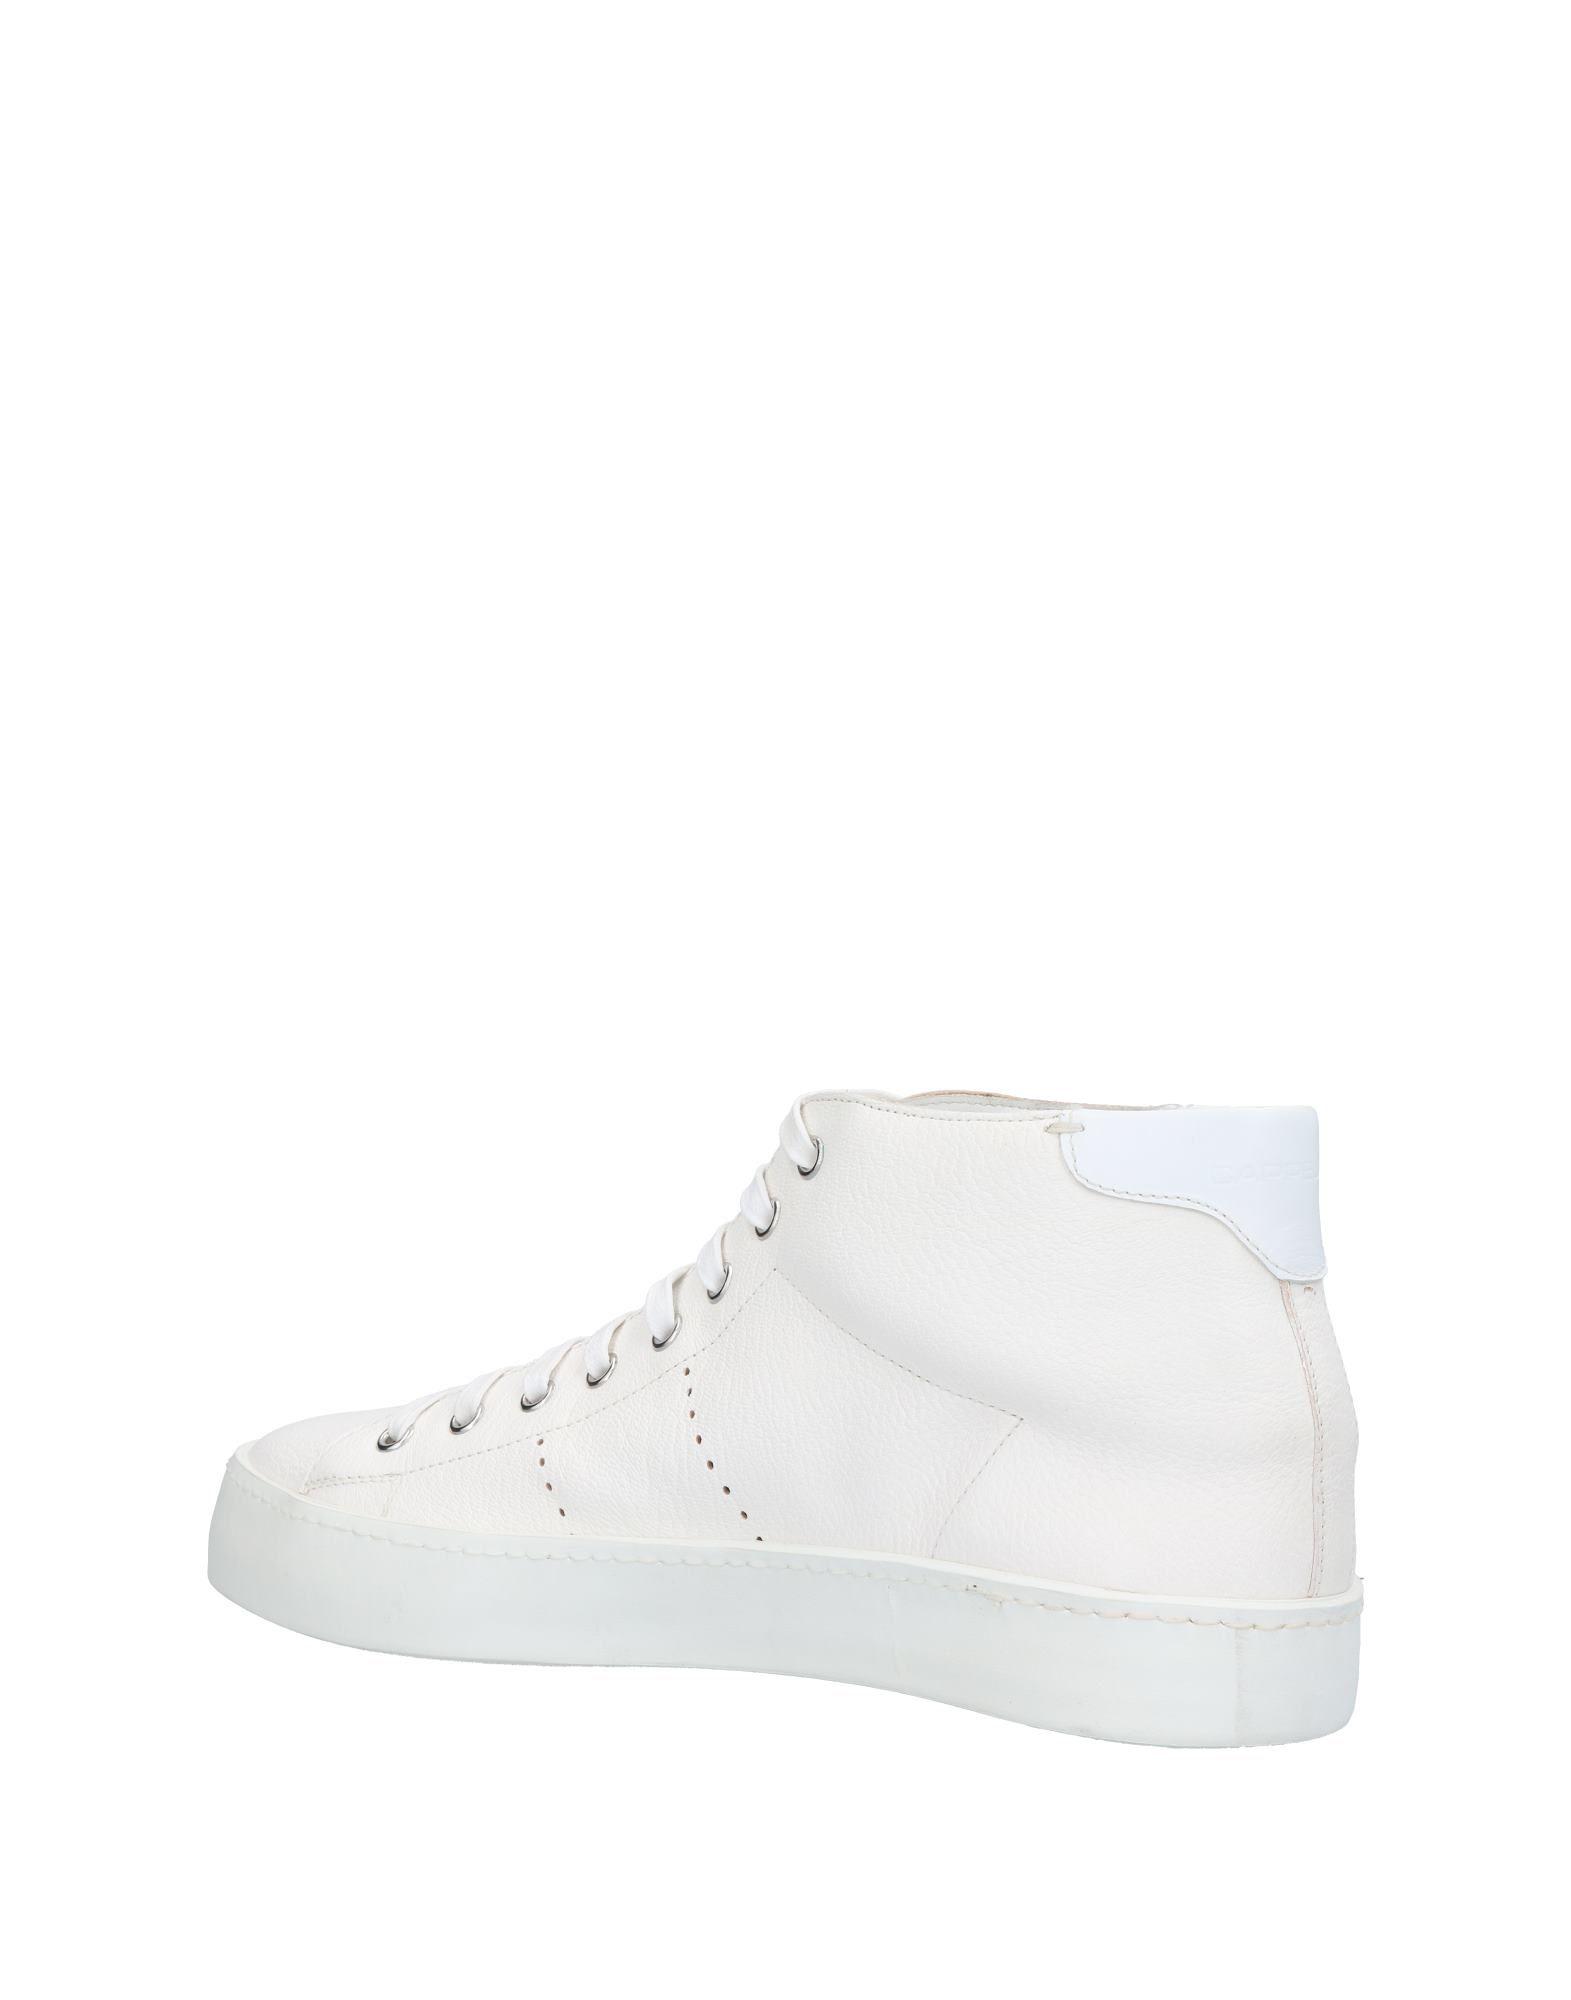 Cappelletti  Sneakers Herren  Cappelletti 11407458FT Heiße Schuhe aa5f5e